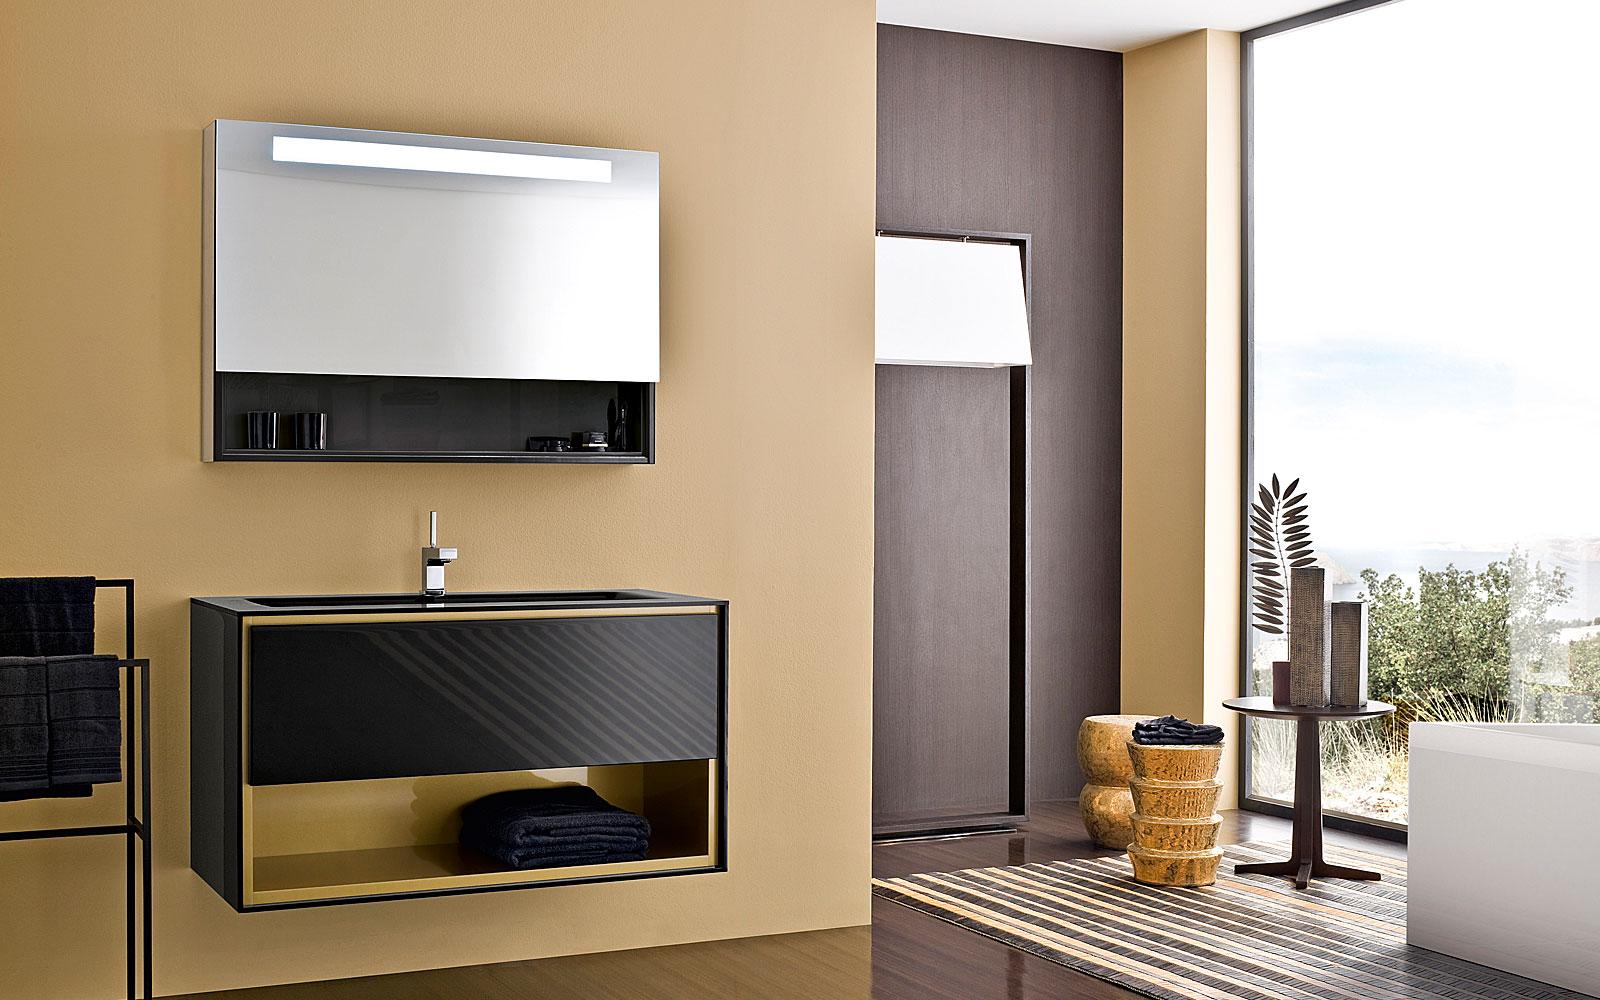 badmanufaktur roth - wohnraumgestaltung - Wohnraumgestaltung